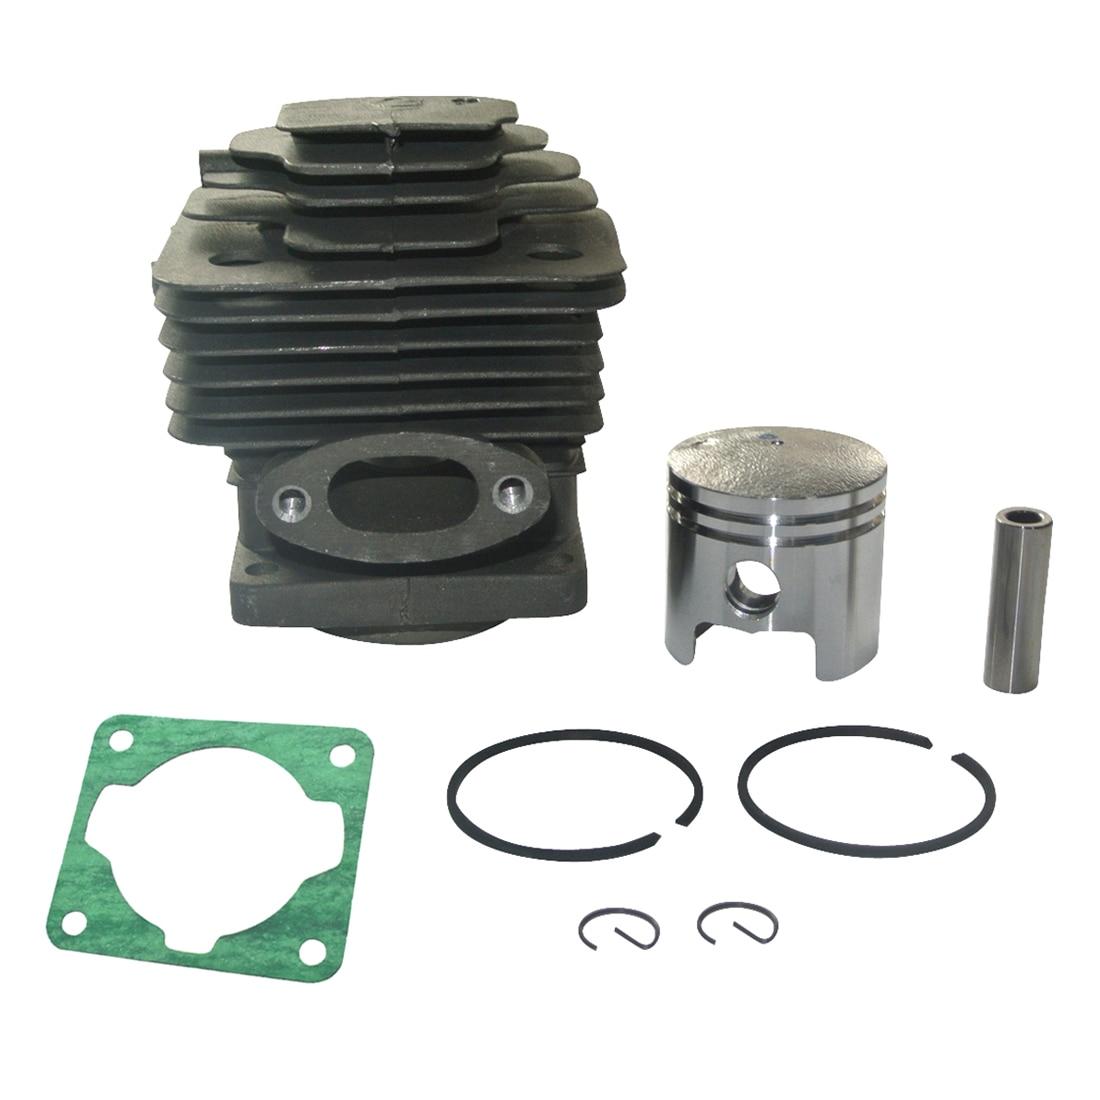 36mm Cylinder Block Piston Kit Ring Set For MITSUBISHI TL33 Chinese BG330 Trimmer